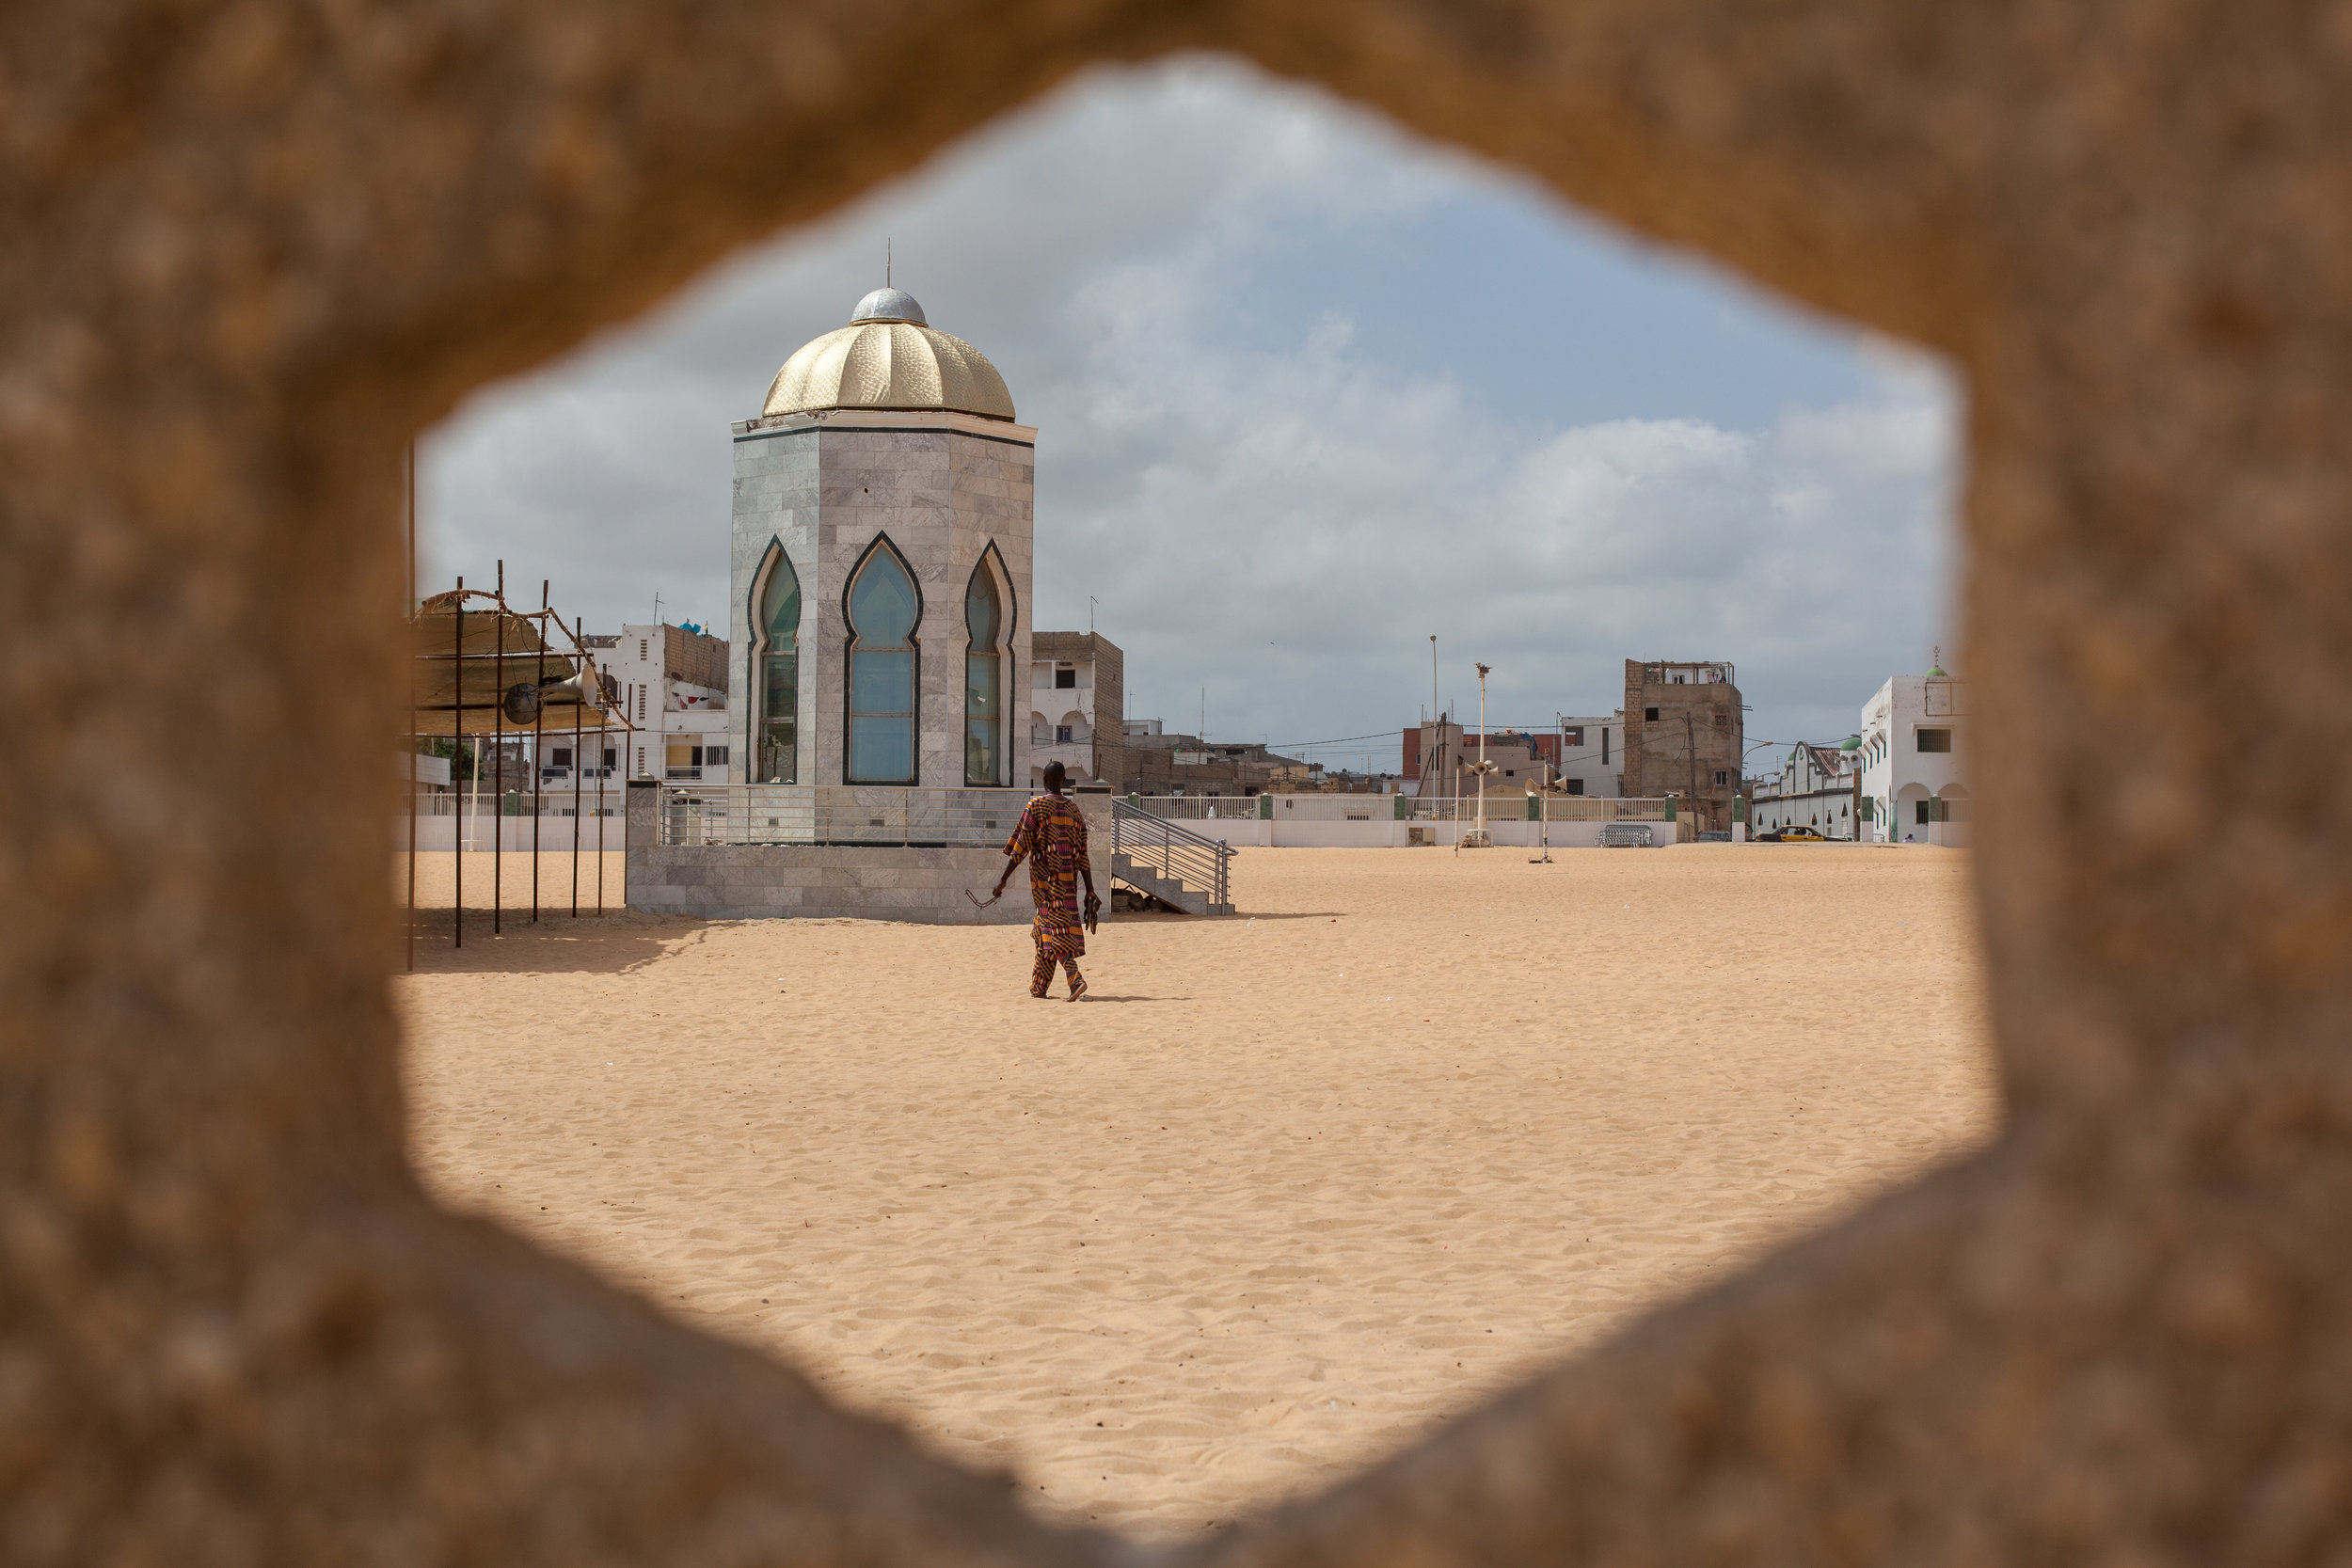 Grande Mosquée de Yoff, Dakar, Senegal.